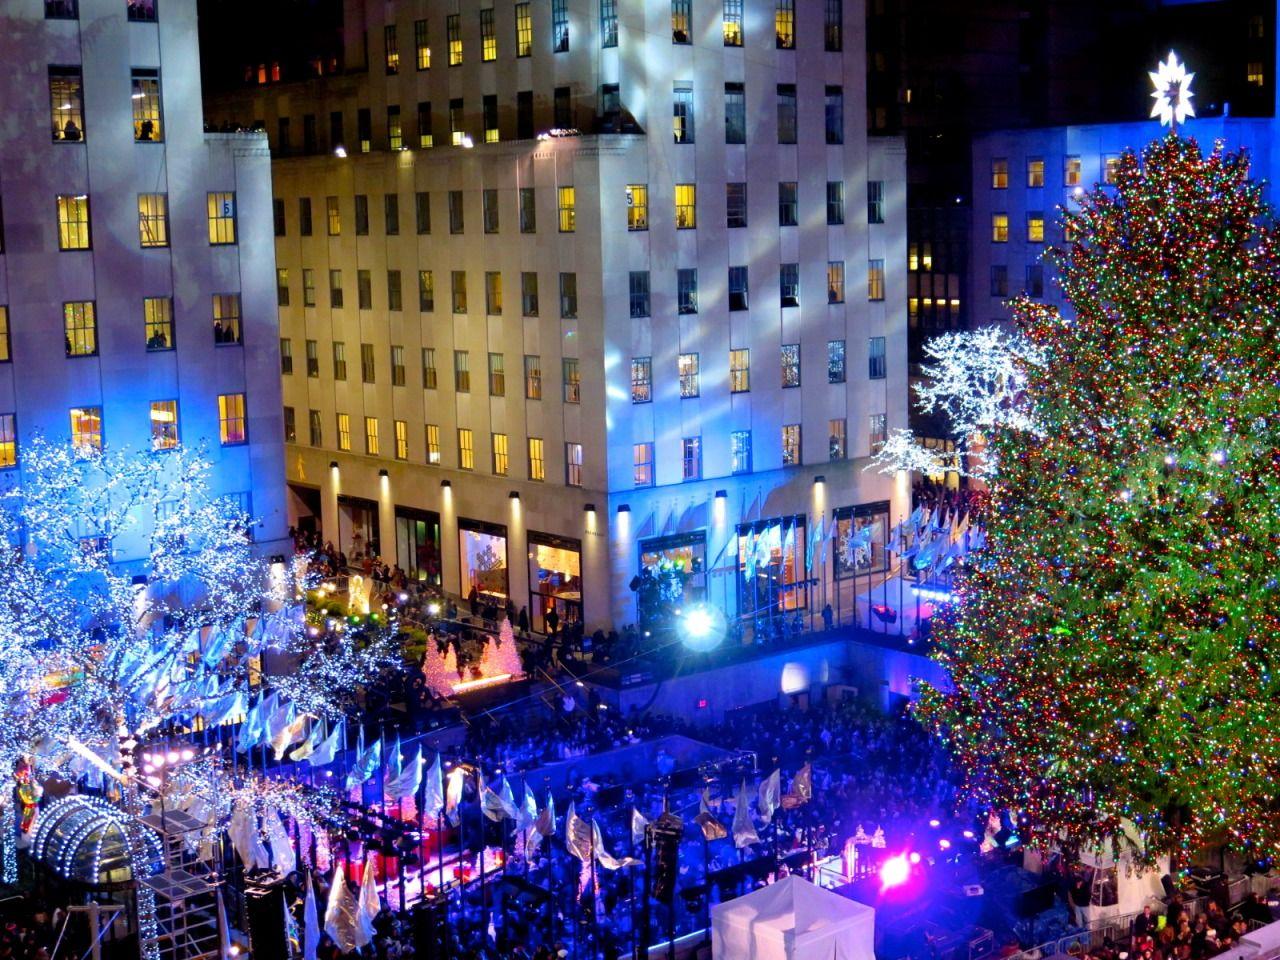 Christmas tree lighting at Rockefeller Center #InStyle